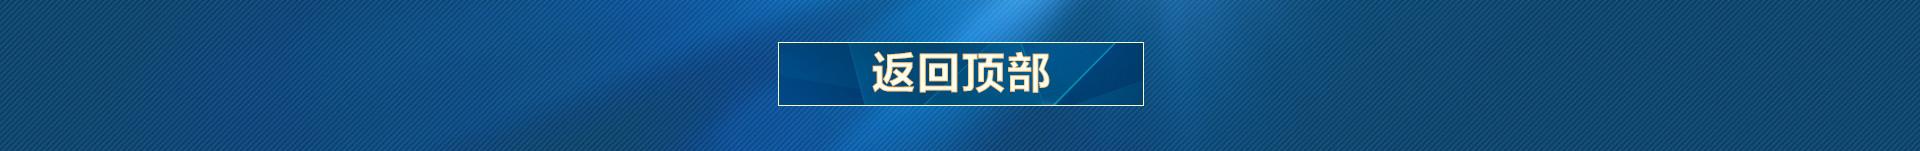 http://image.suning.cn/uimg/sop/commodity/181549488411435457595016_x.jpg